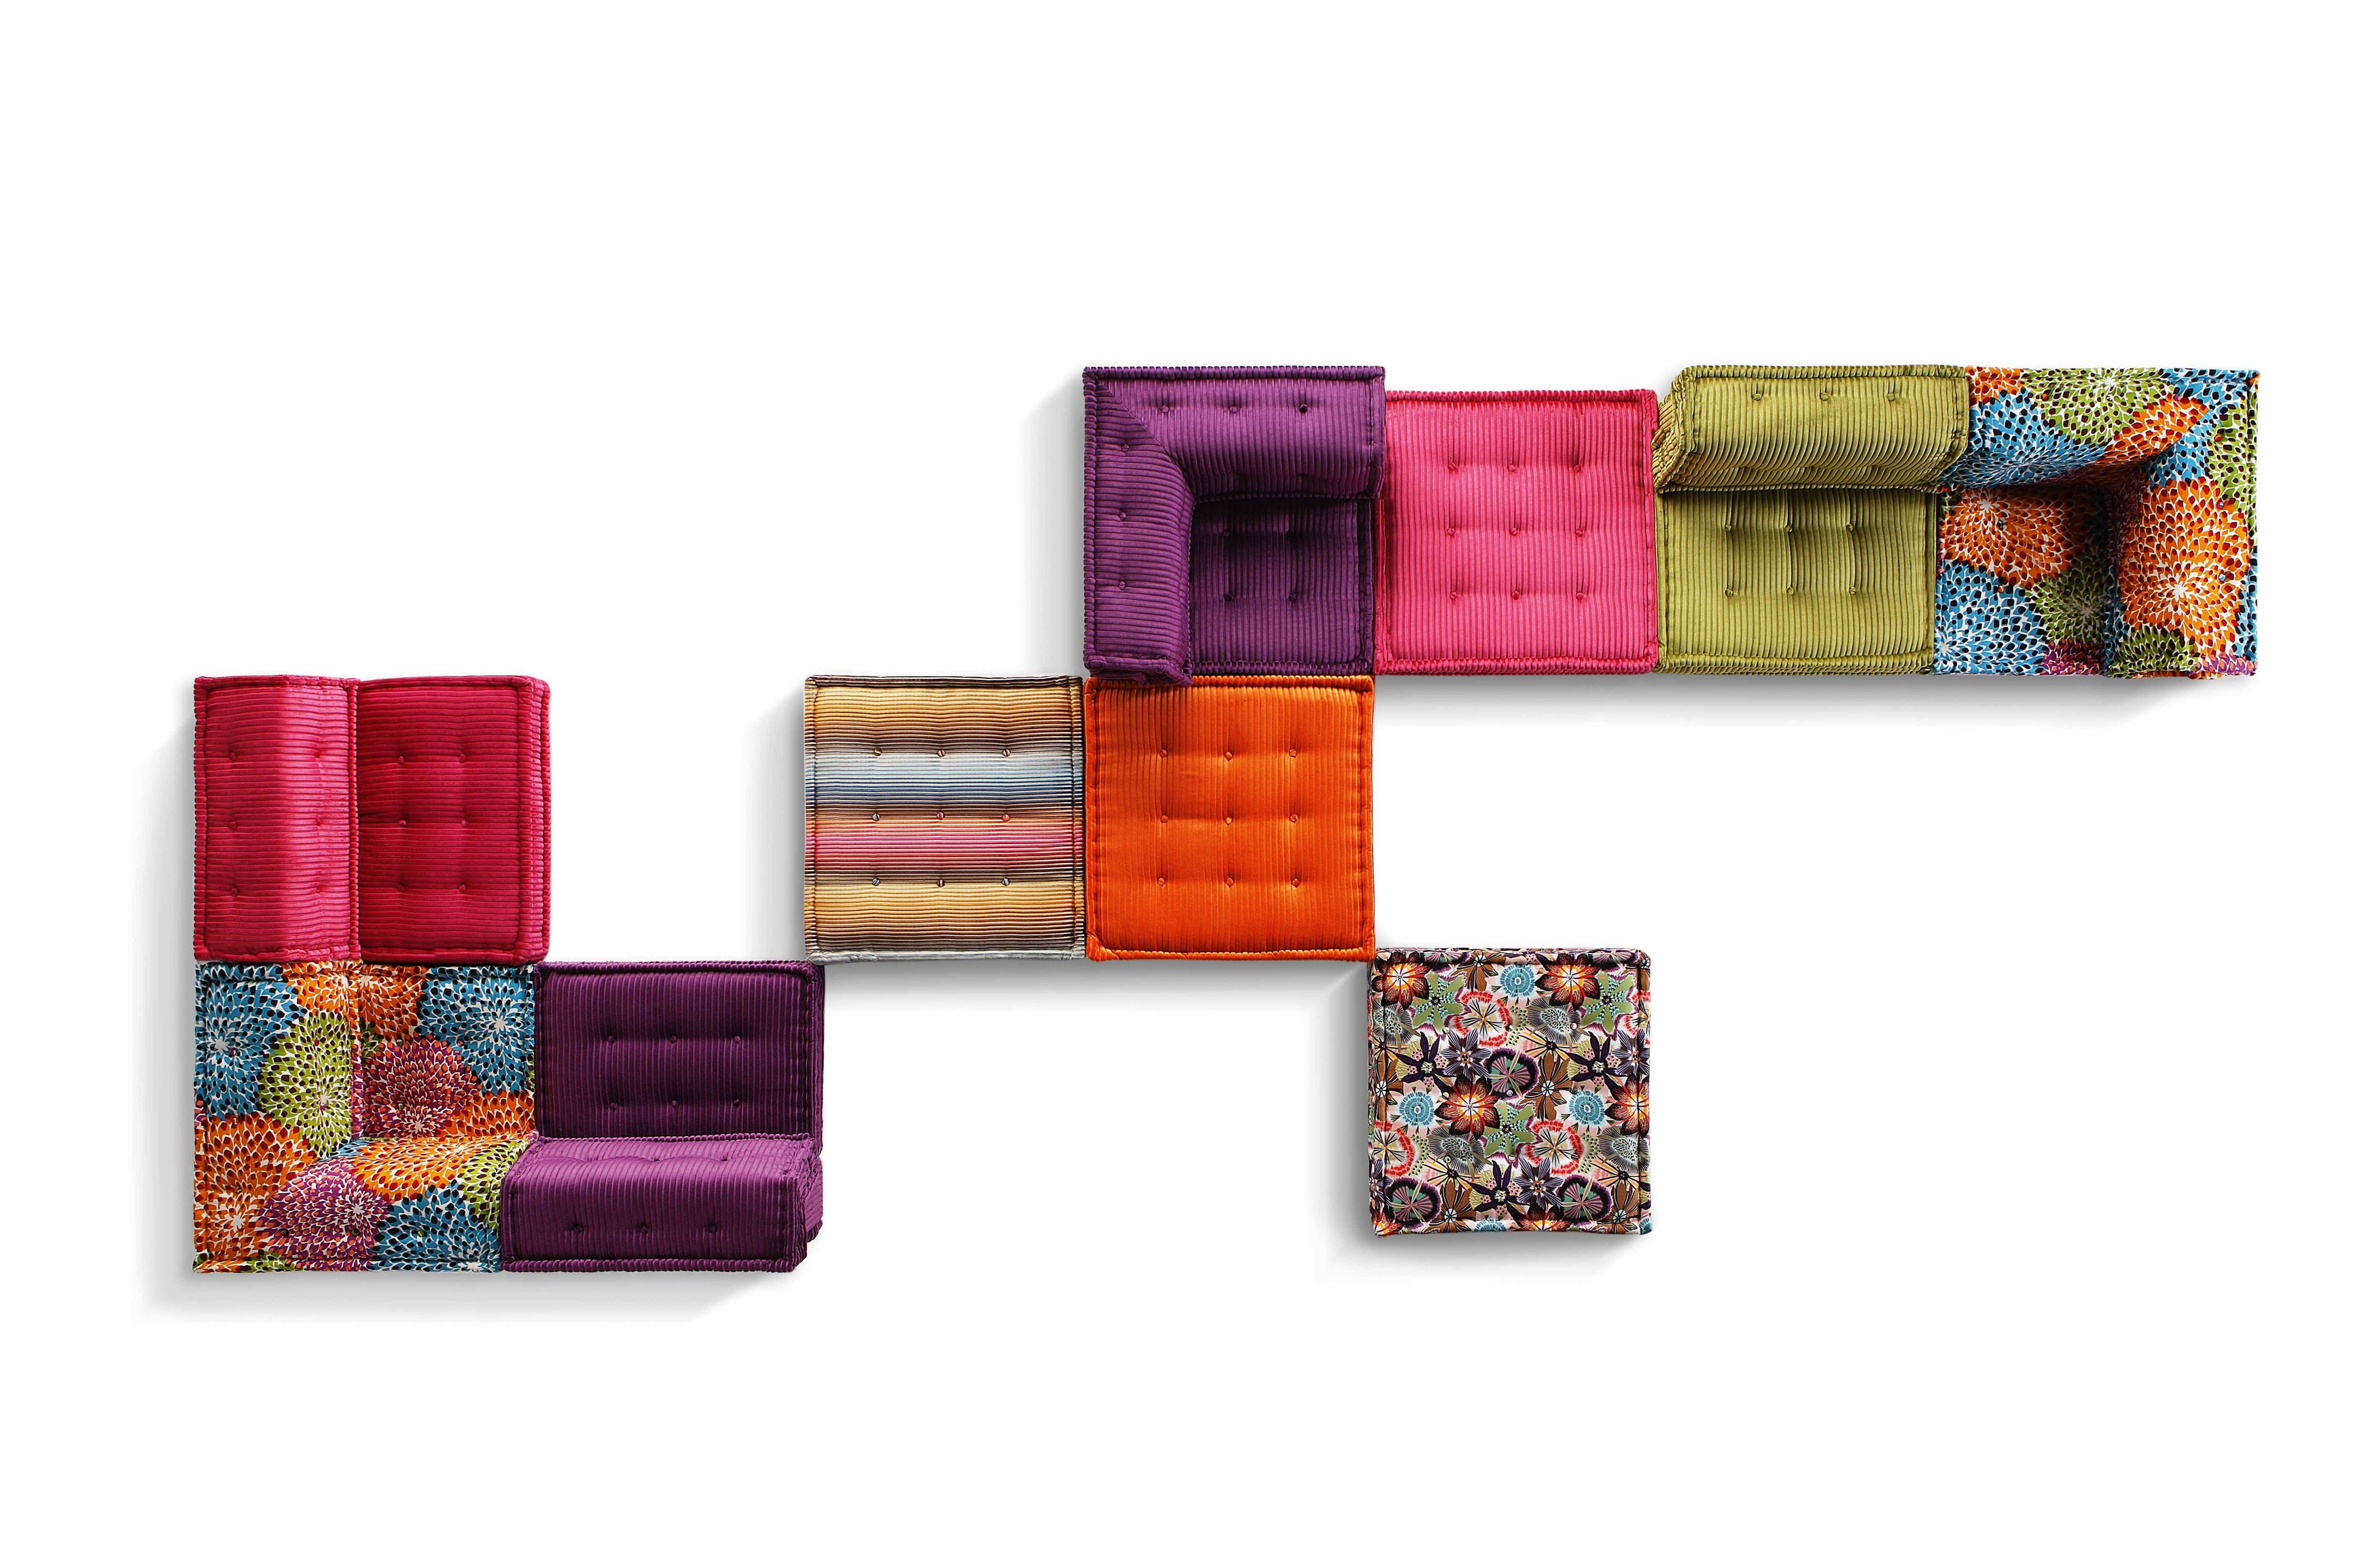 Sectional Fabric Sofa Mah Jong Missoni Home By Roche Bobois Design Hans Hopfer